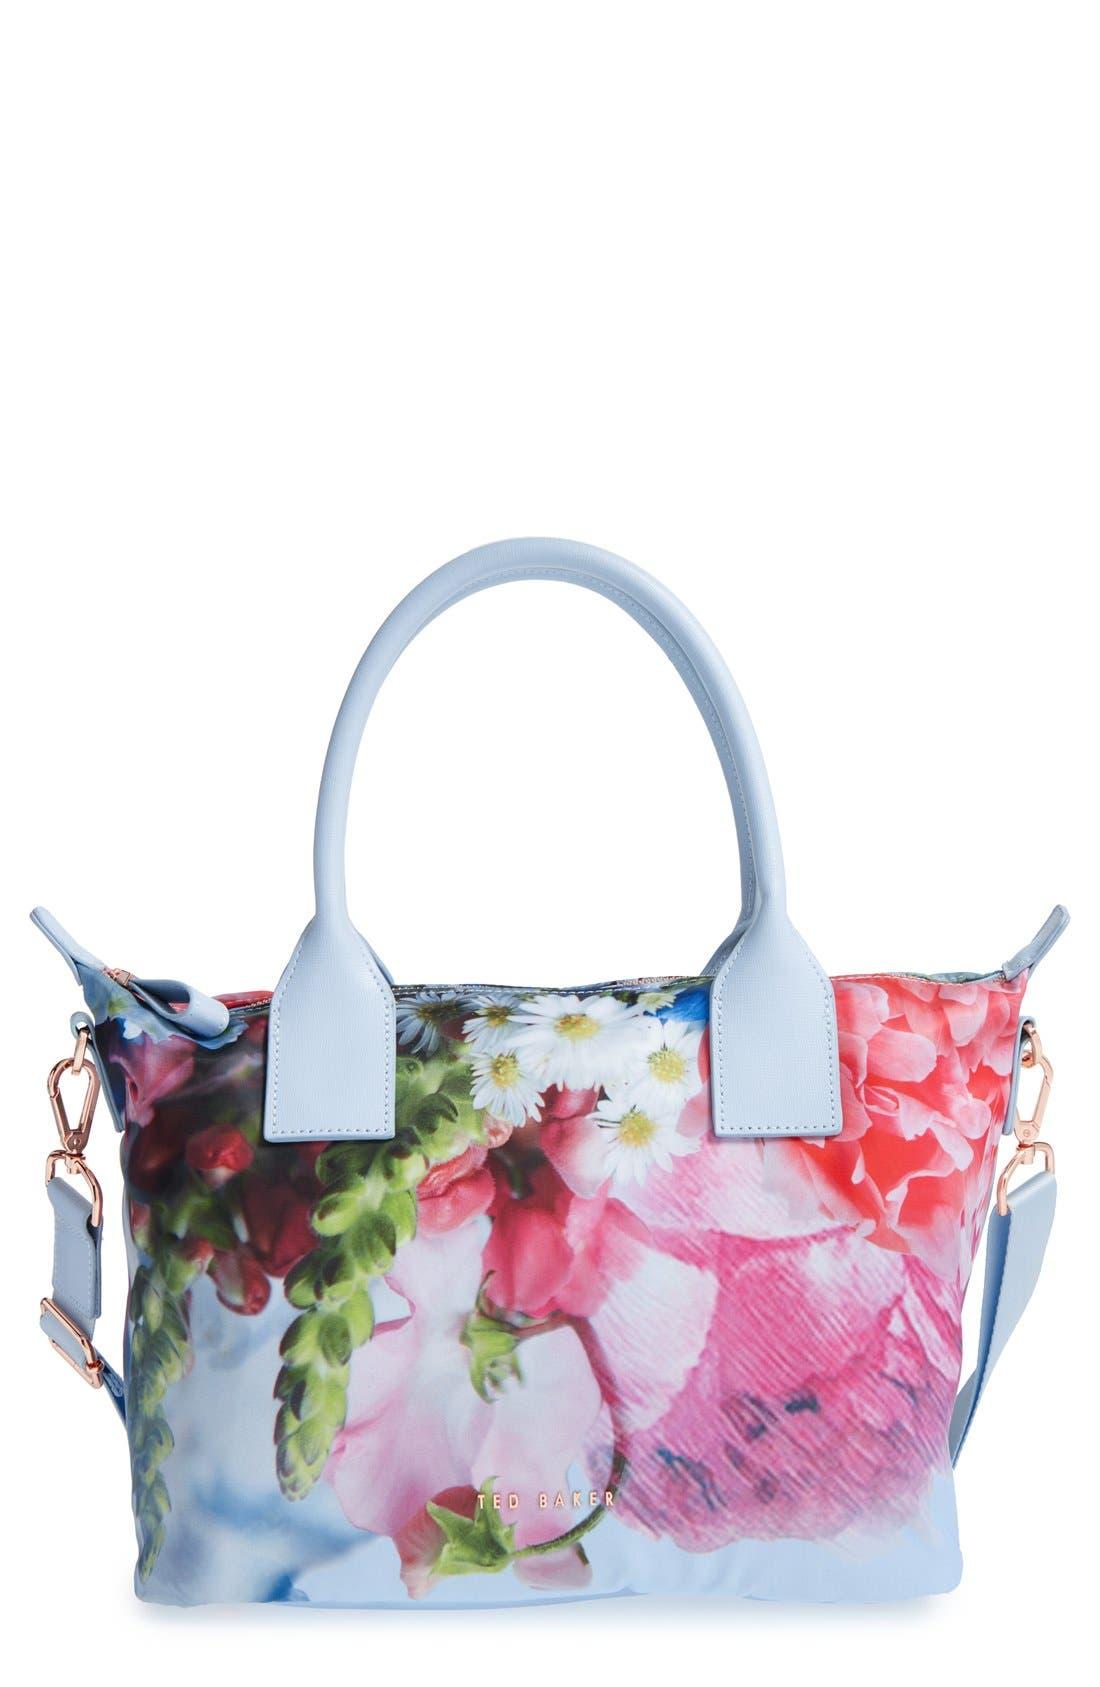 Alternate Image 1 Selected - Ted Baker London 'Small Vlora' Floral Crossbody Satchel